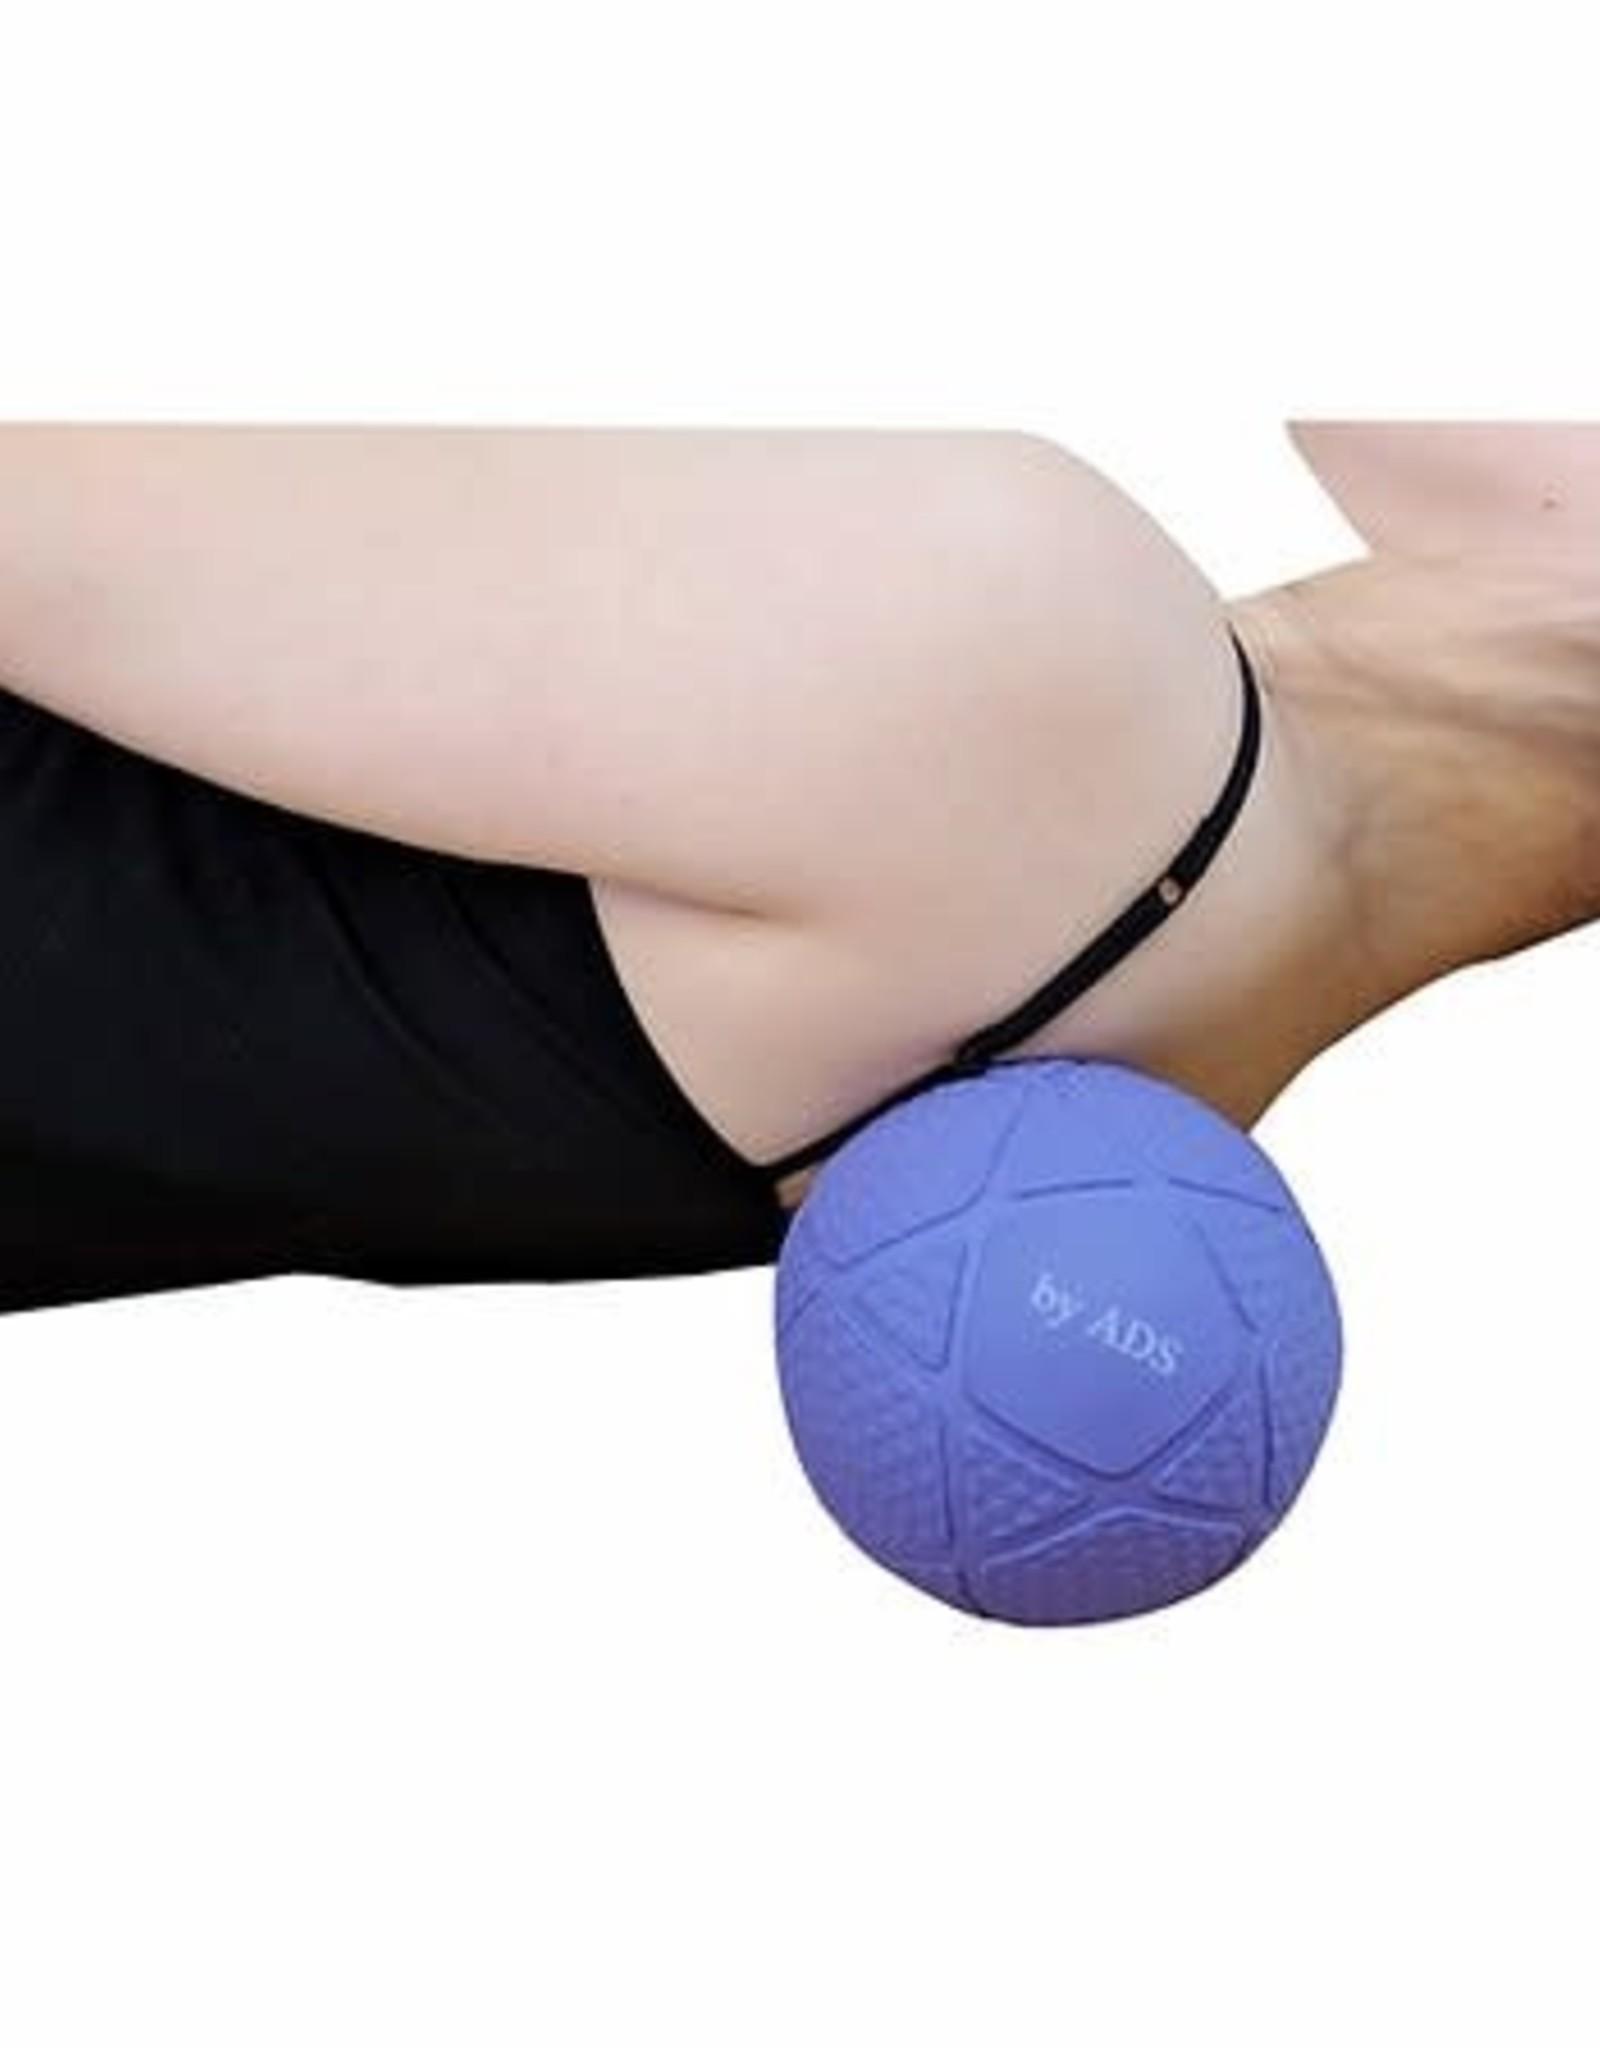 American Dance Supply PETIT BALLON (Massage ball)